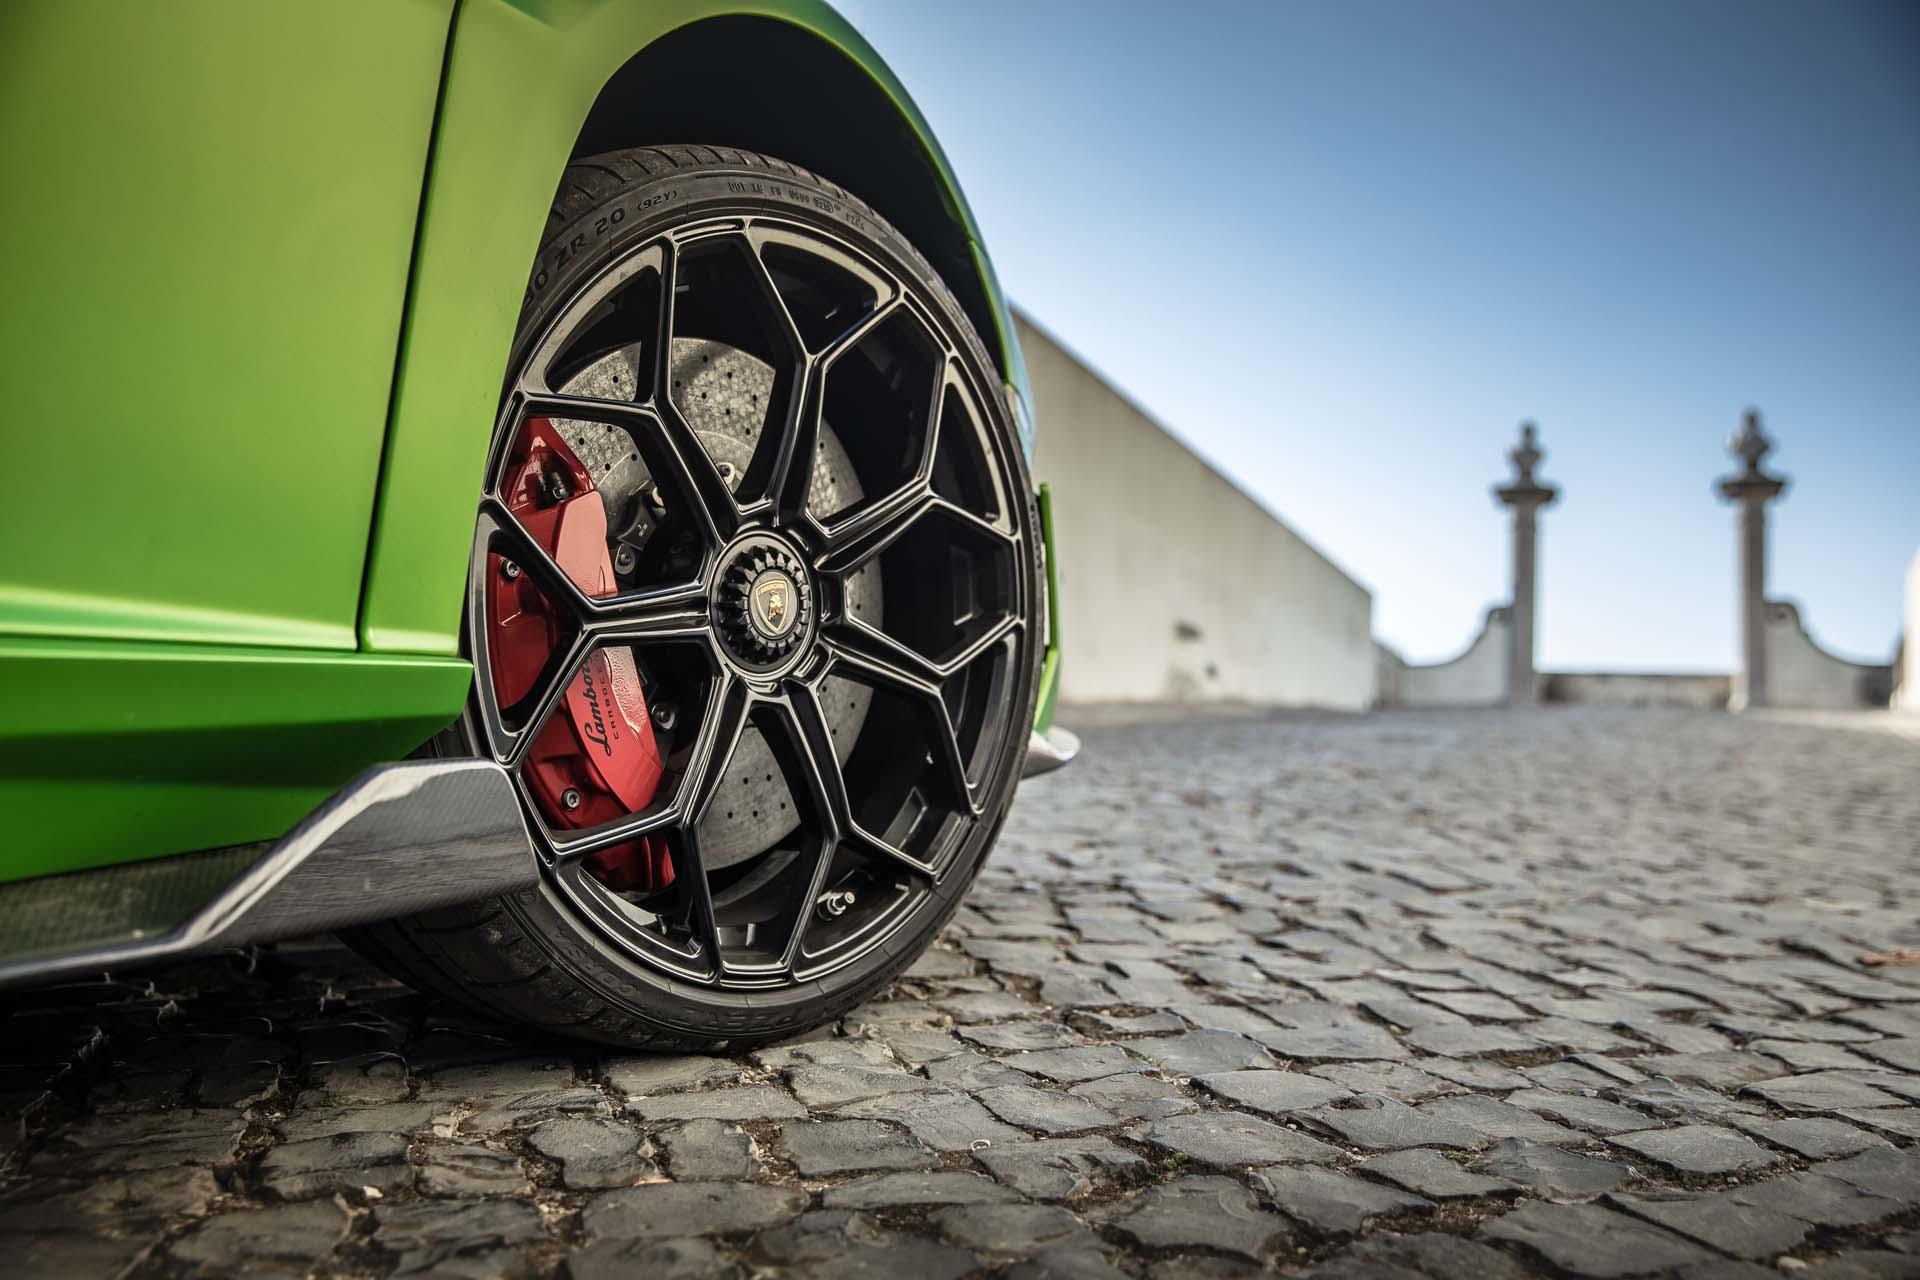 2019 Lamborghini Aventador SVJ Wheel Wallpapers #65 of 241